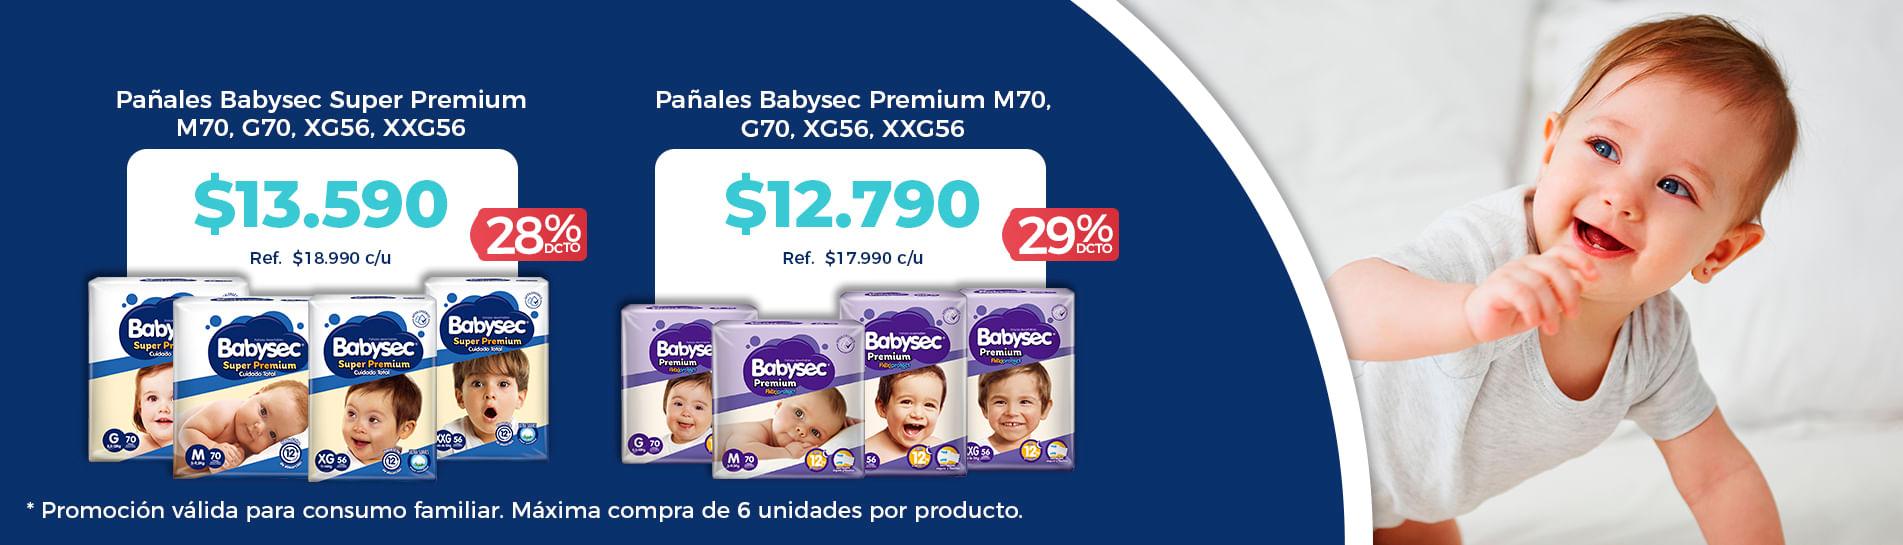 babysec-premium-noviembre